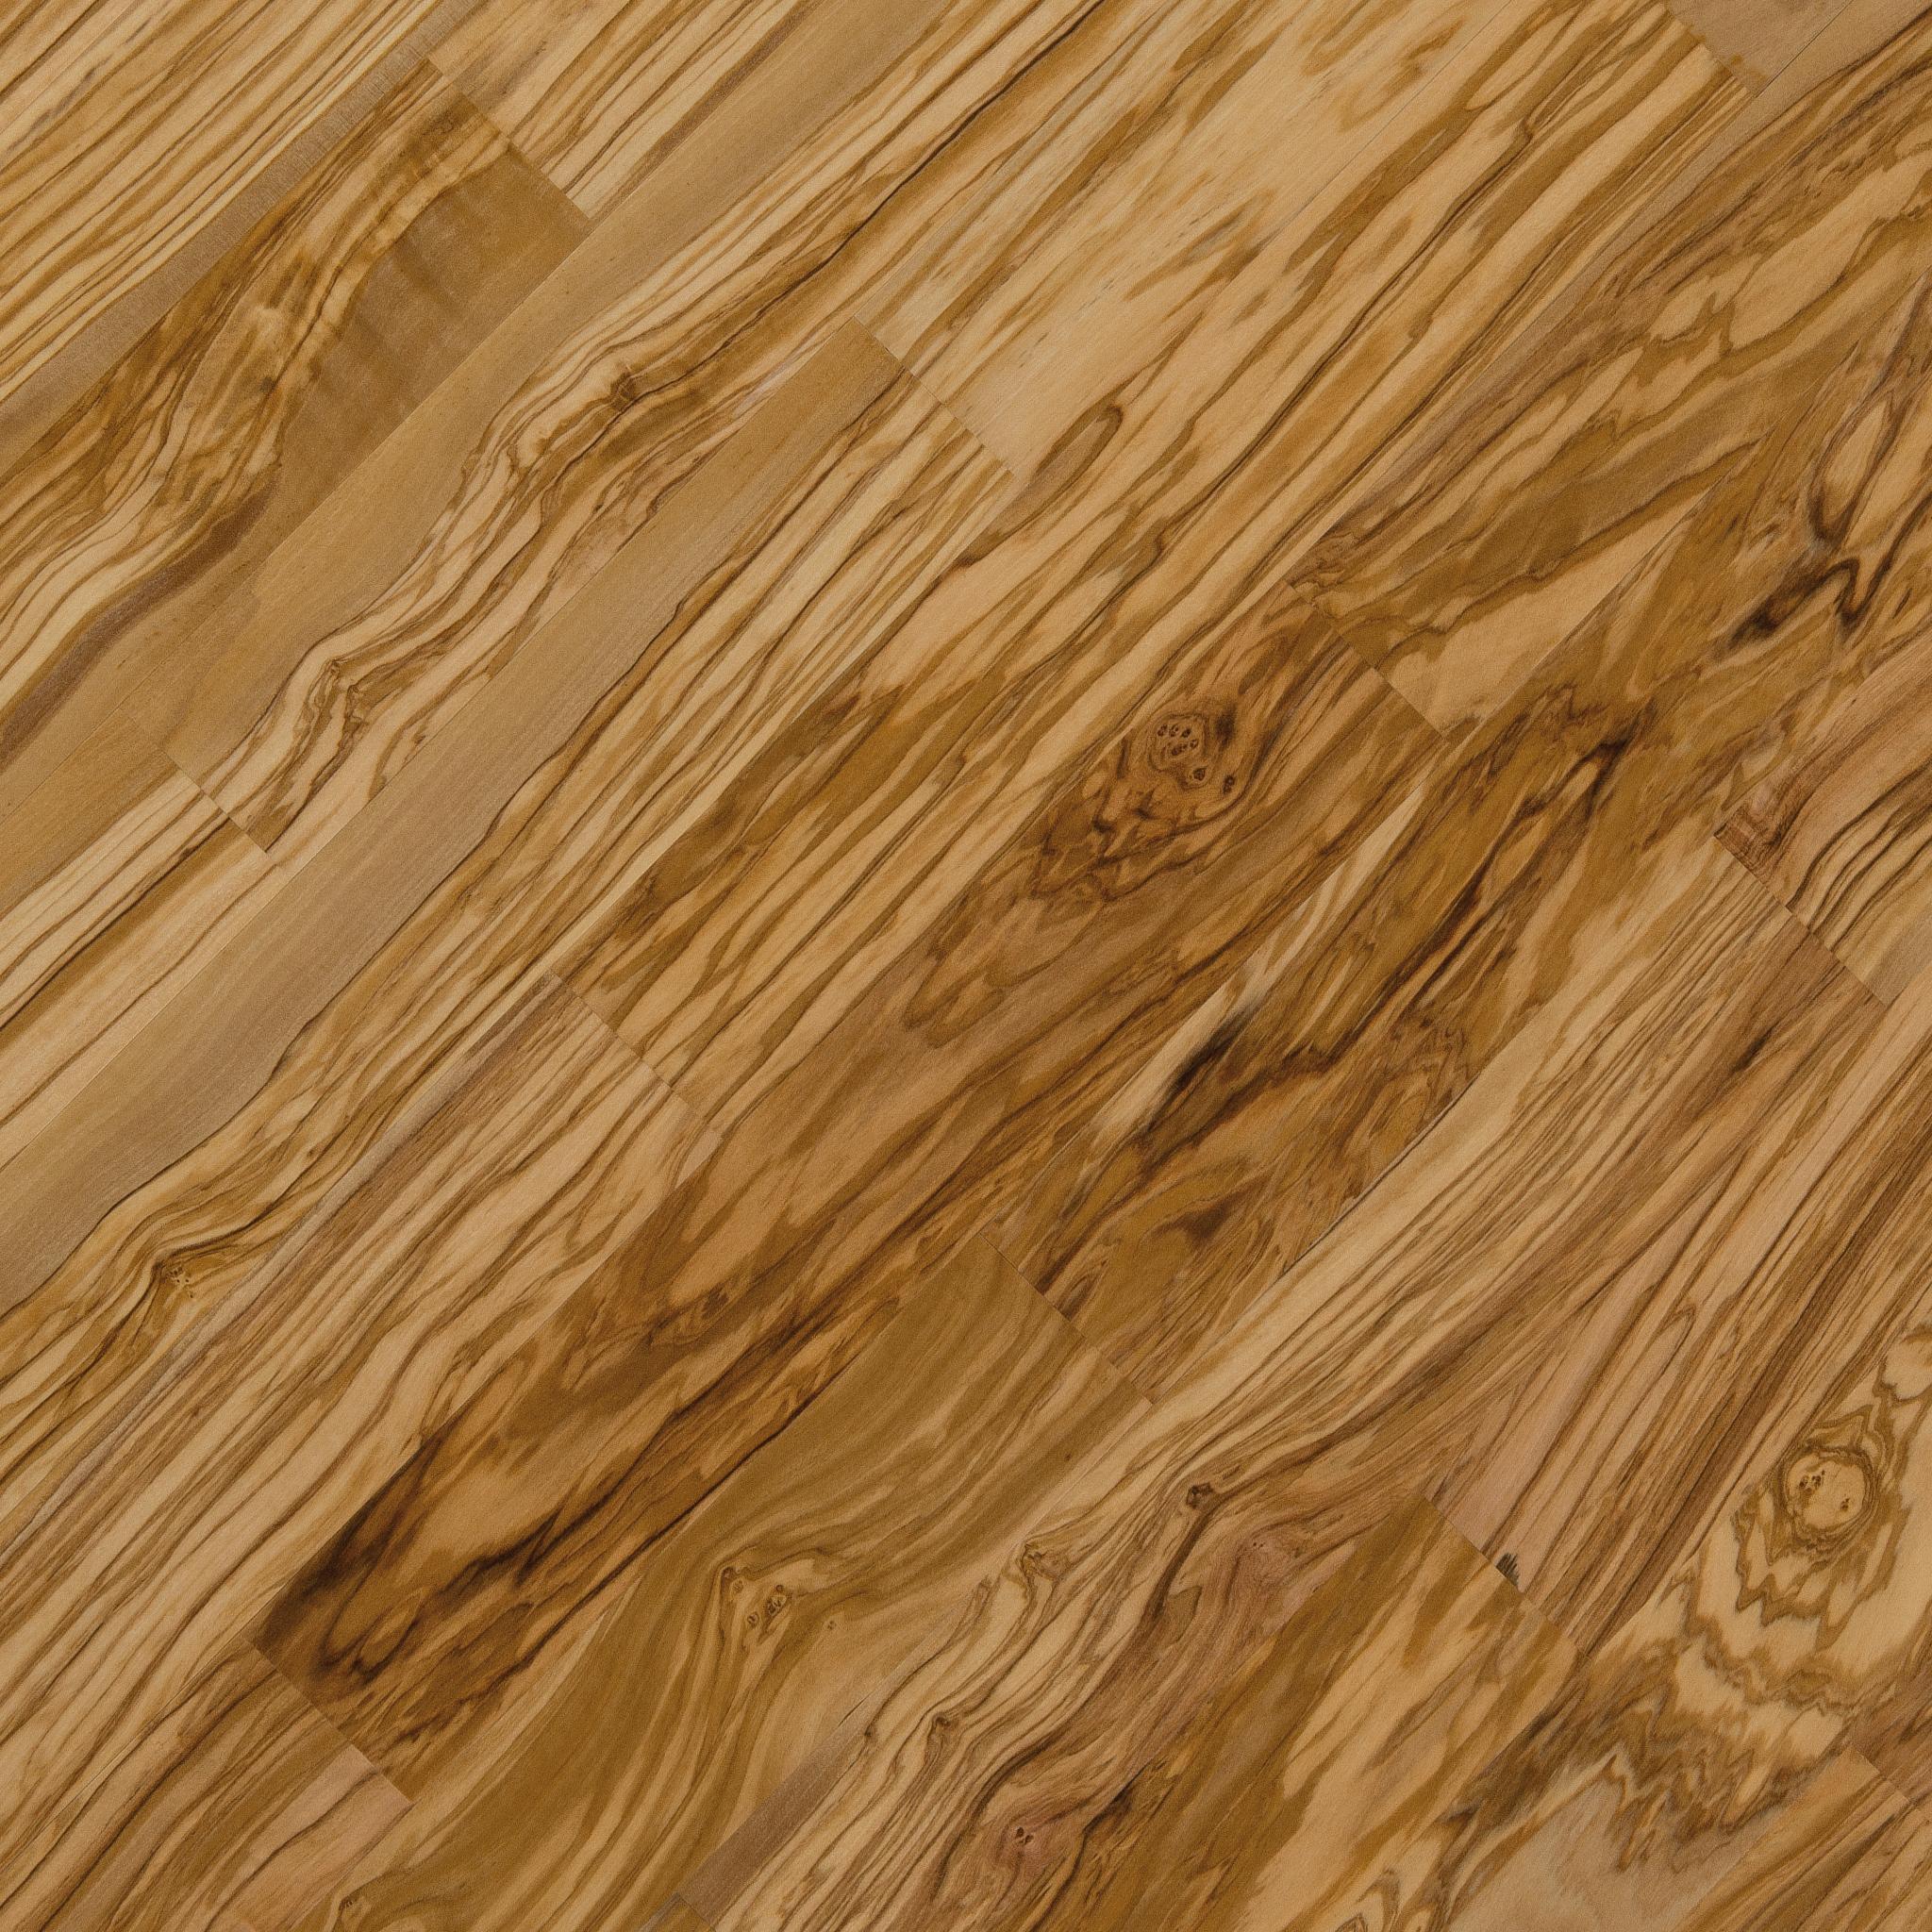 Olive wood parquet Venato Extra V14